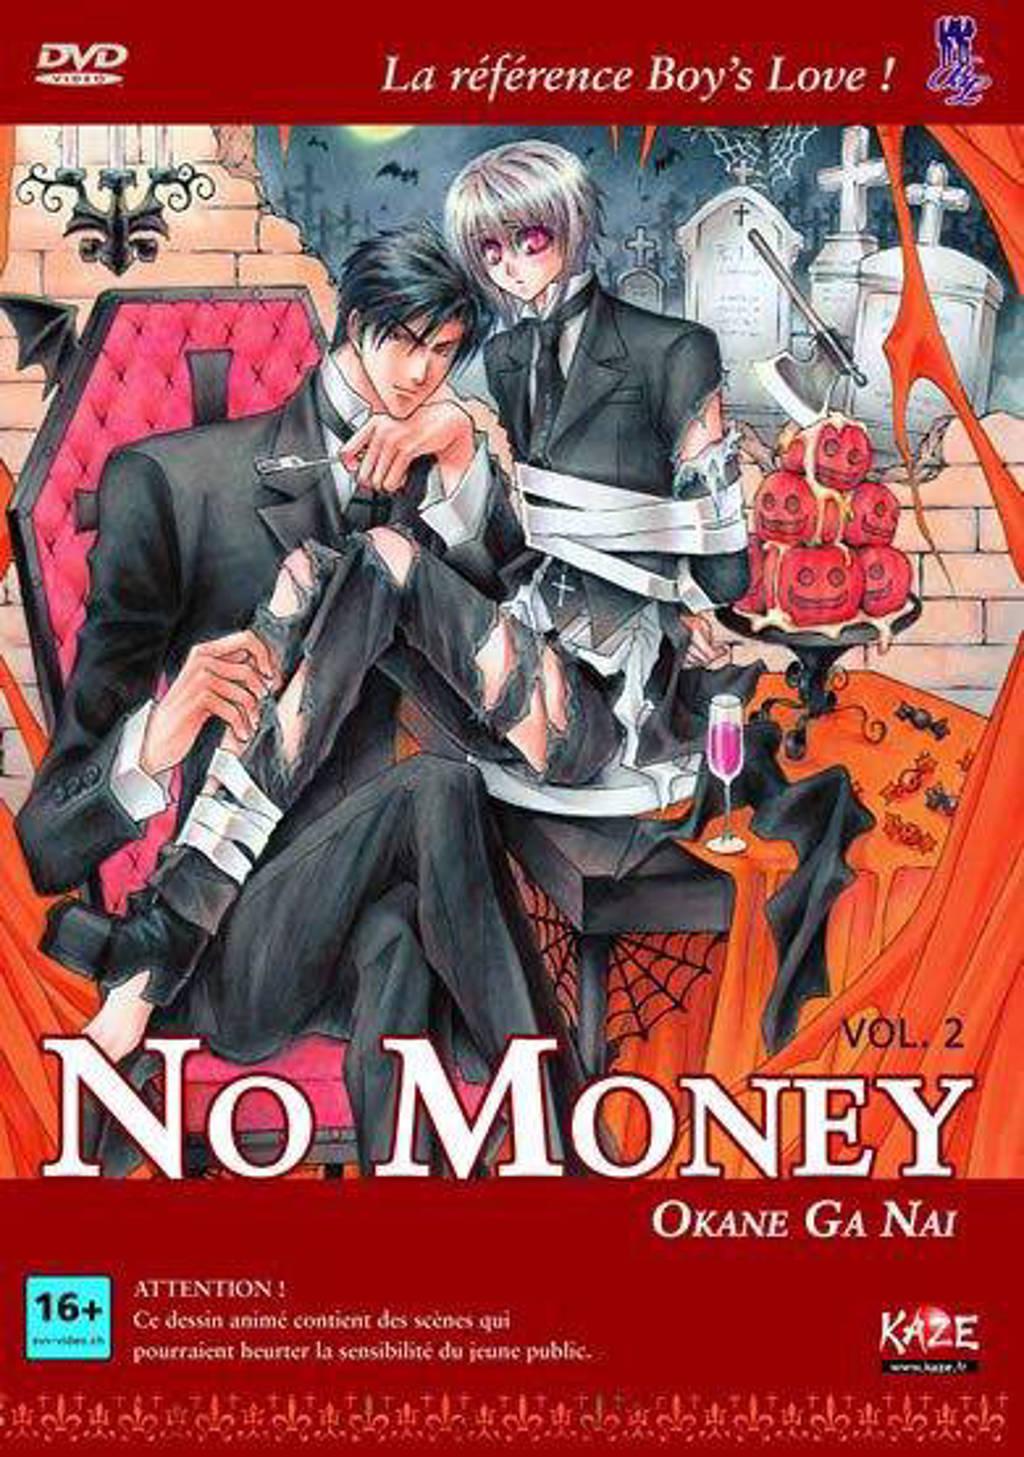 No money 2 (DVD)